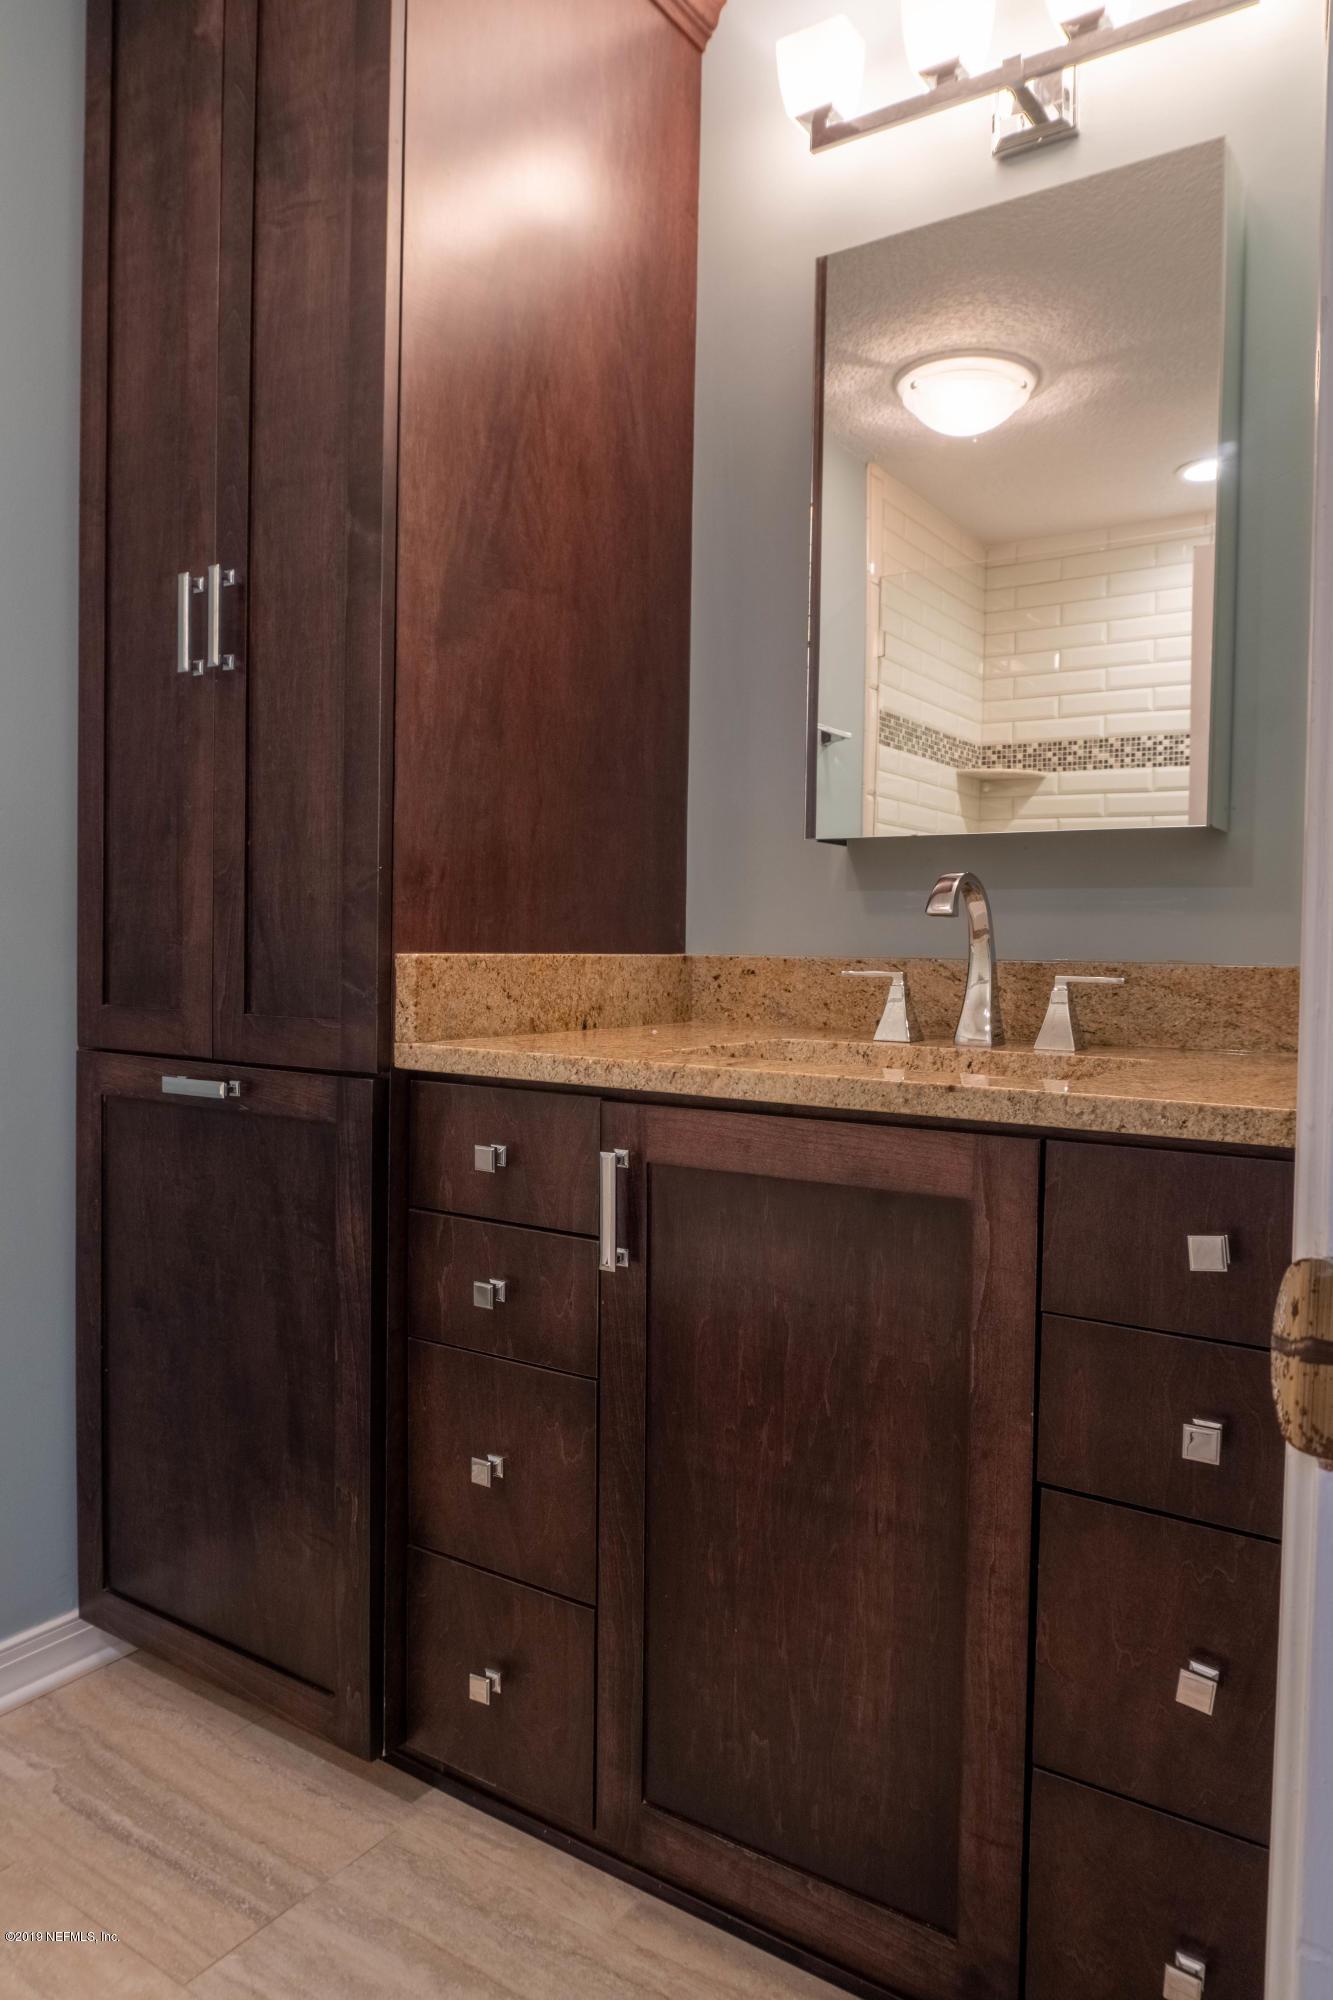 2 LITTLE BAY HARBOR- PONTE VEDRA BEACH- FLORIDA 32082, 2 Bedrooms Bedrooms, ,2 BathroomsBathrooms,Condo,For sale,LITTLE BAY HARBOR,1013842